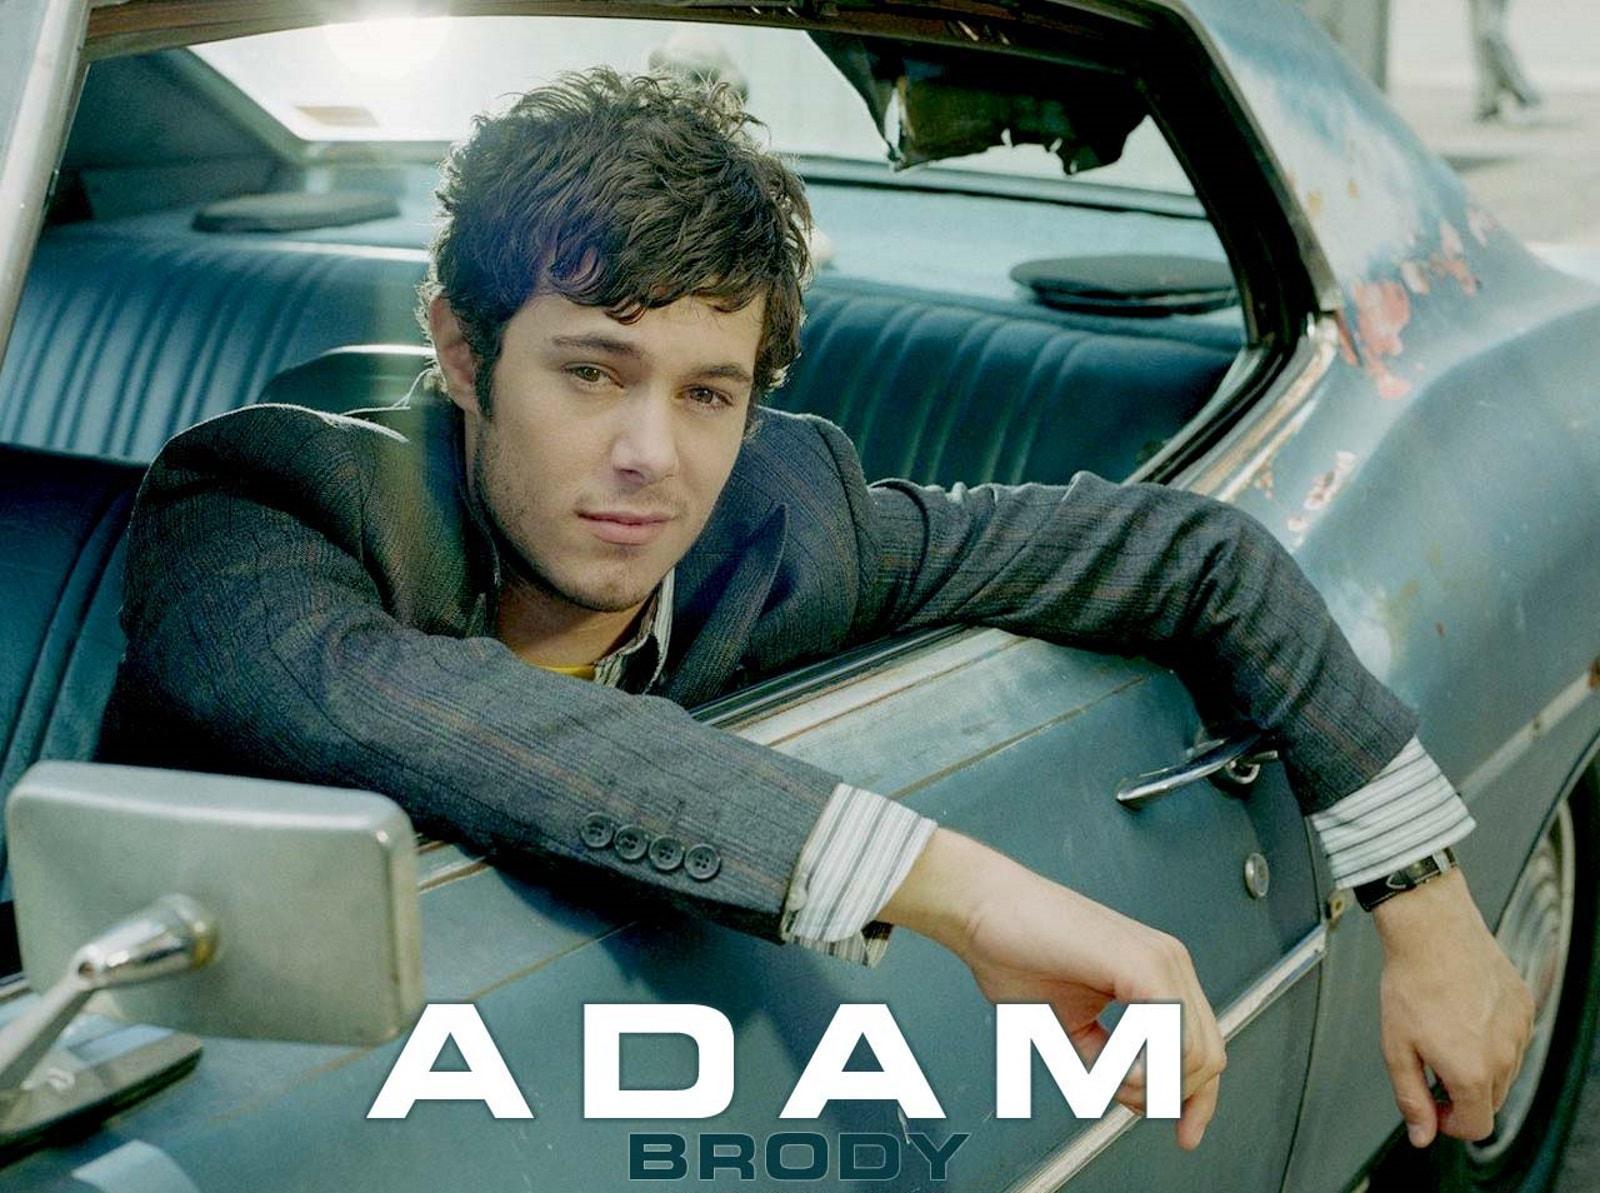 Adam Brody Background